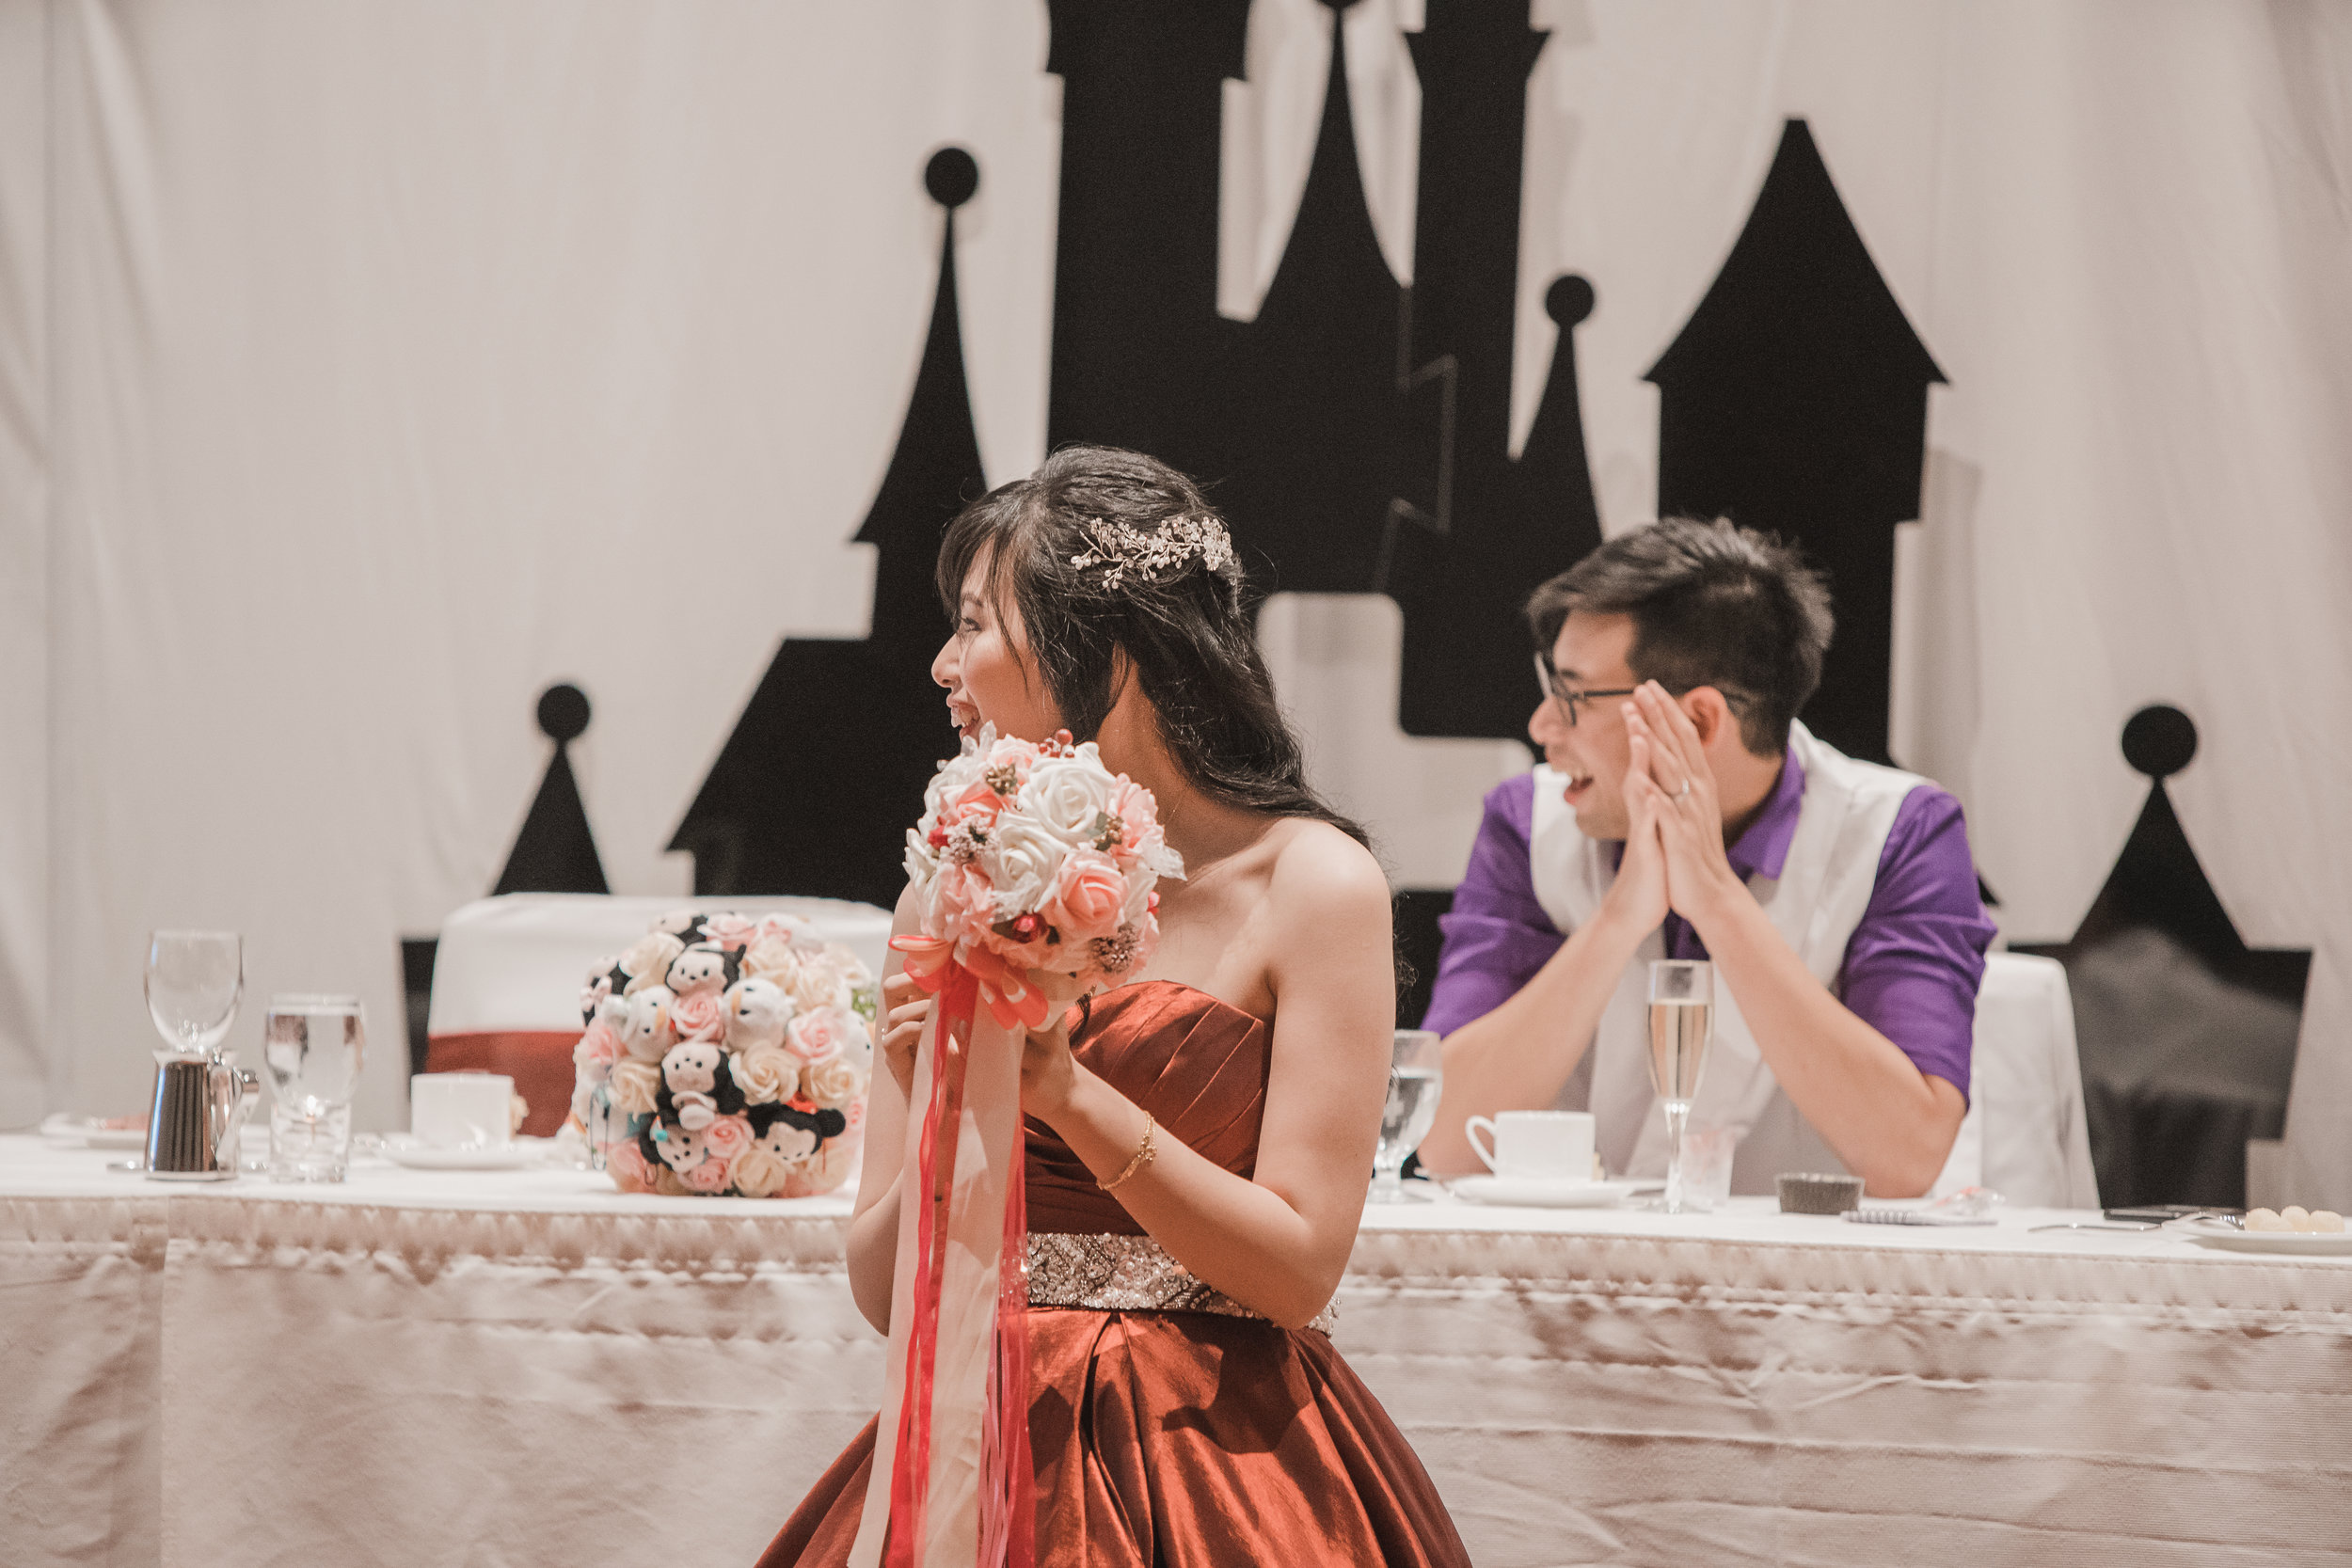 20190520 - Pamela & Matthew Wedding - 0336.jpg